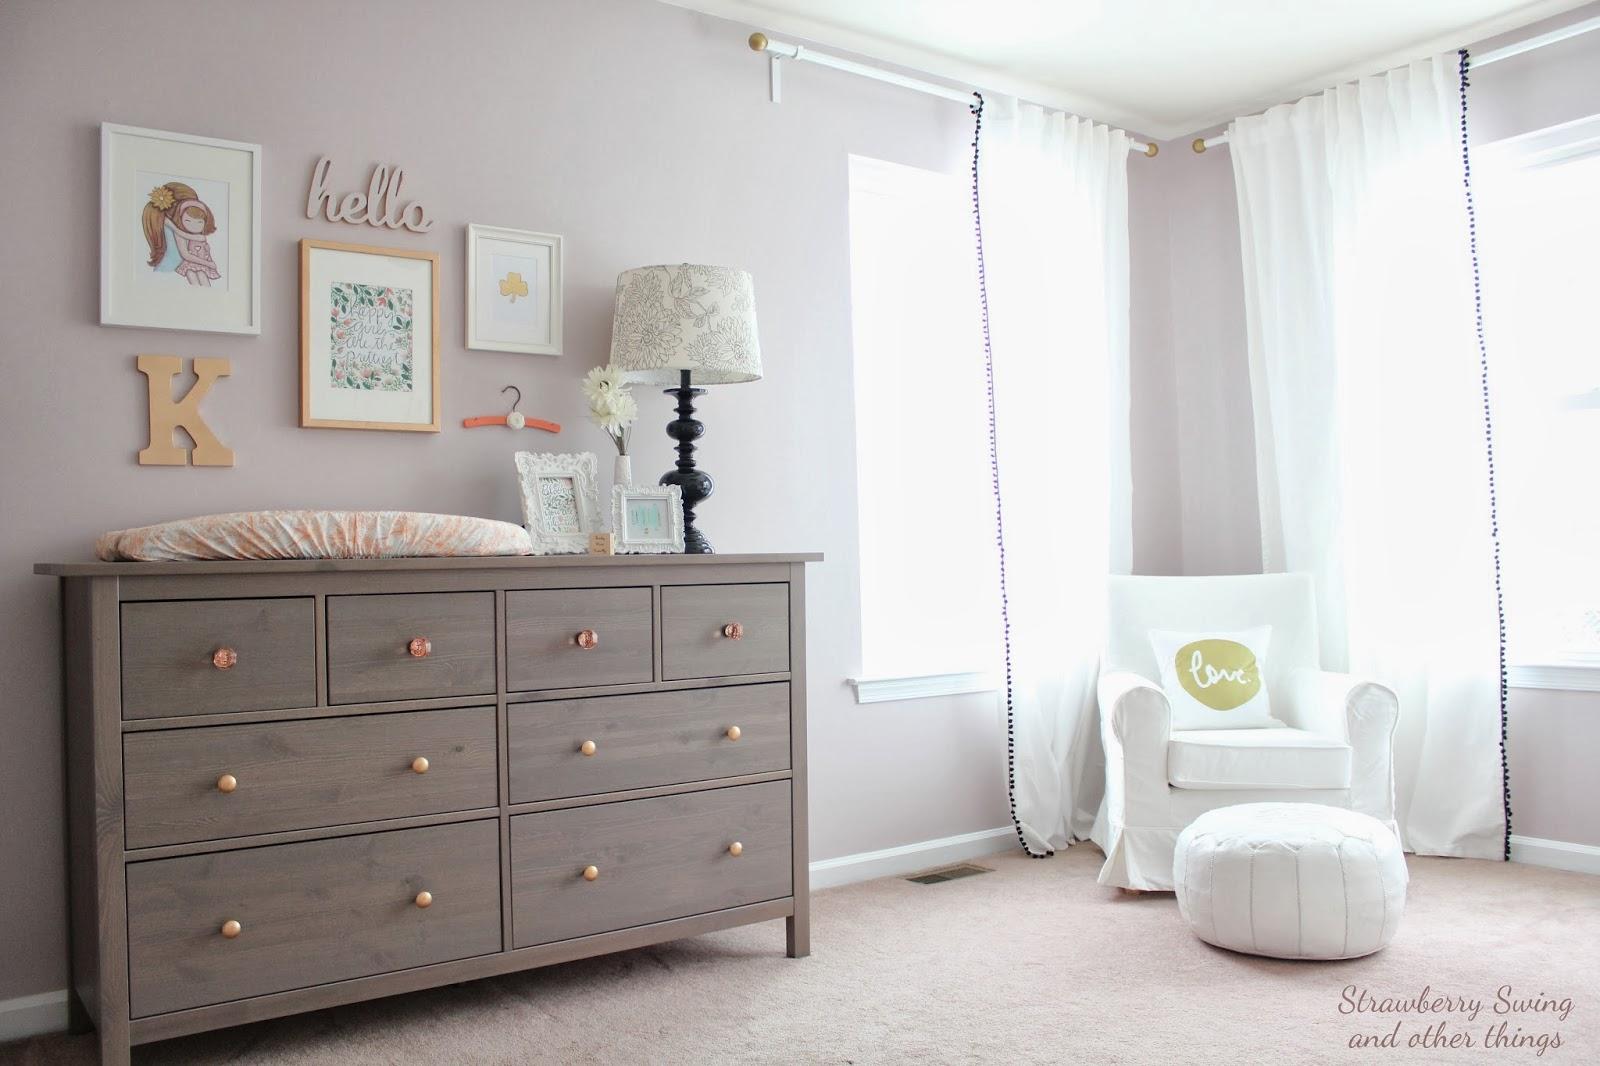 Strawberry swing and other things little room 2 kenley - Habitaciones de ikea ...